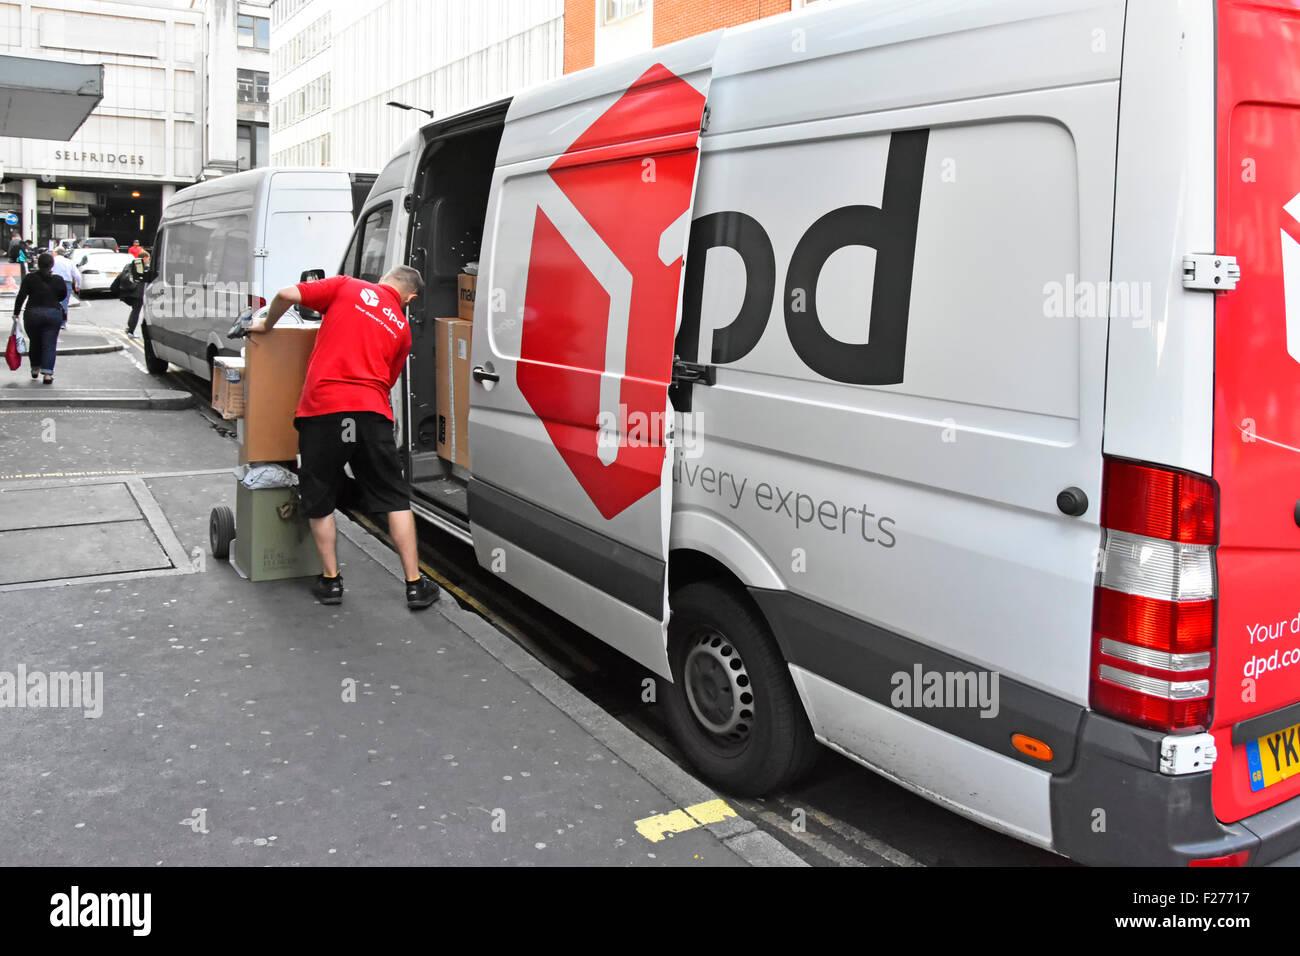 Controlador de entrega hombre cargando bultos en camilla de entrega DPD van Londres England Reino Unido Imagen De Stock